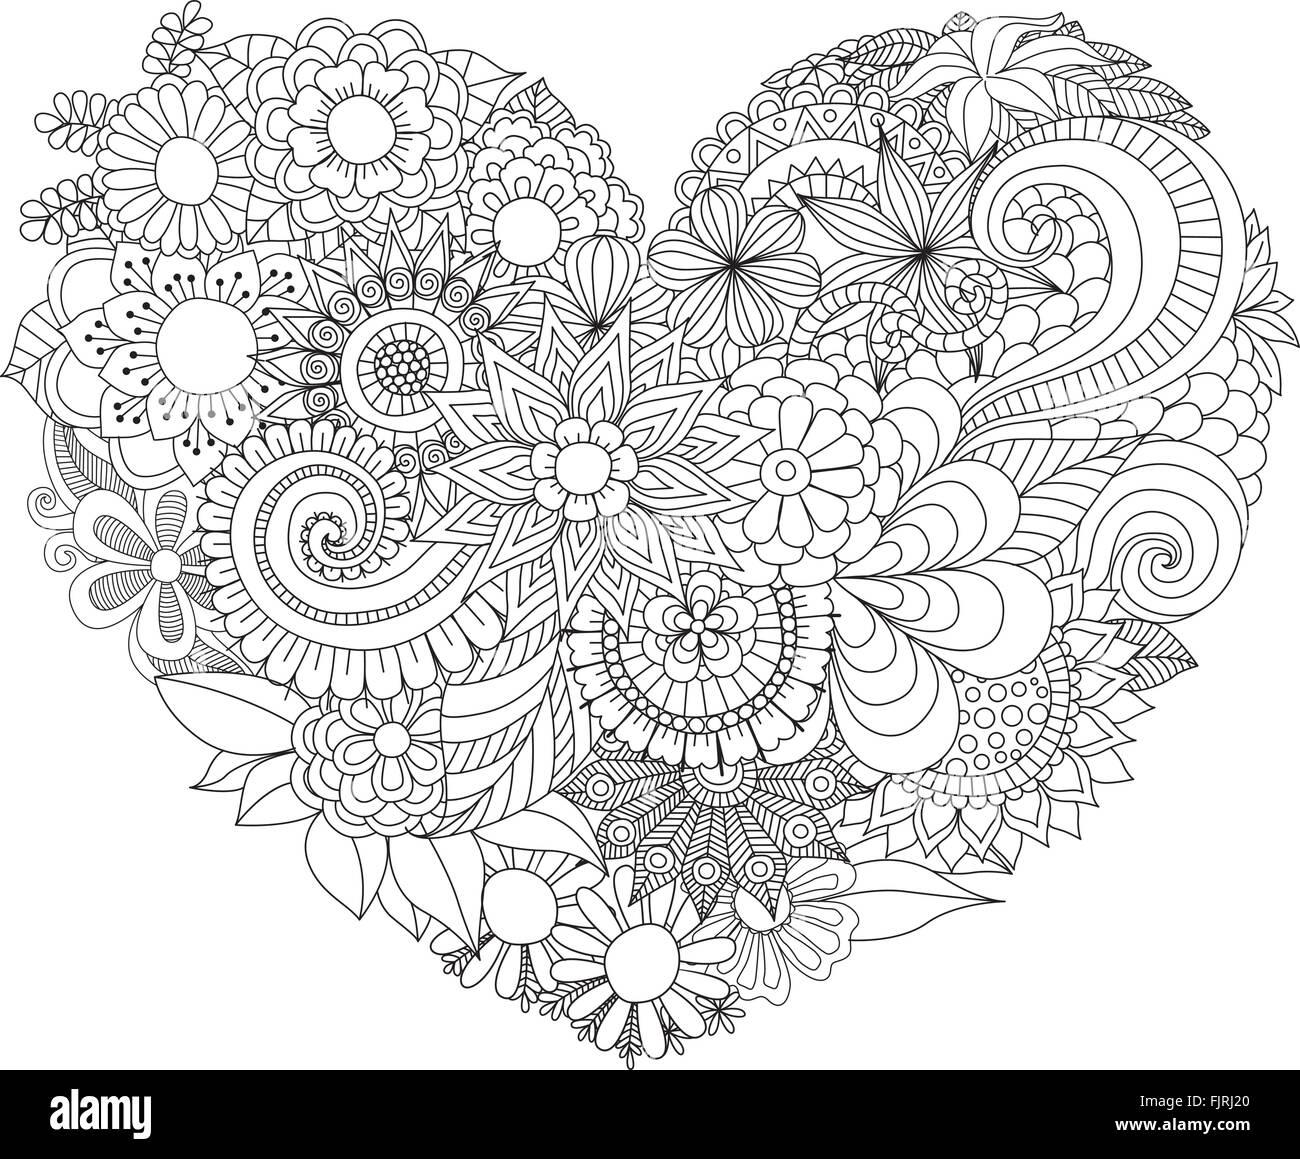 Beautiful Flower Line Drawing : Line art design of beautiful flowers in heart shape for